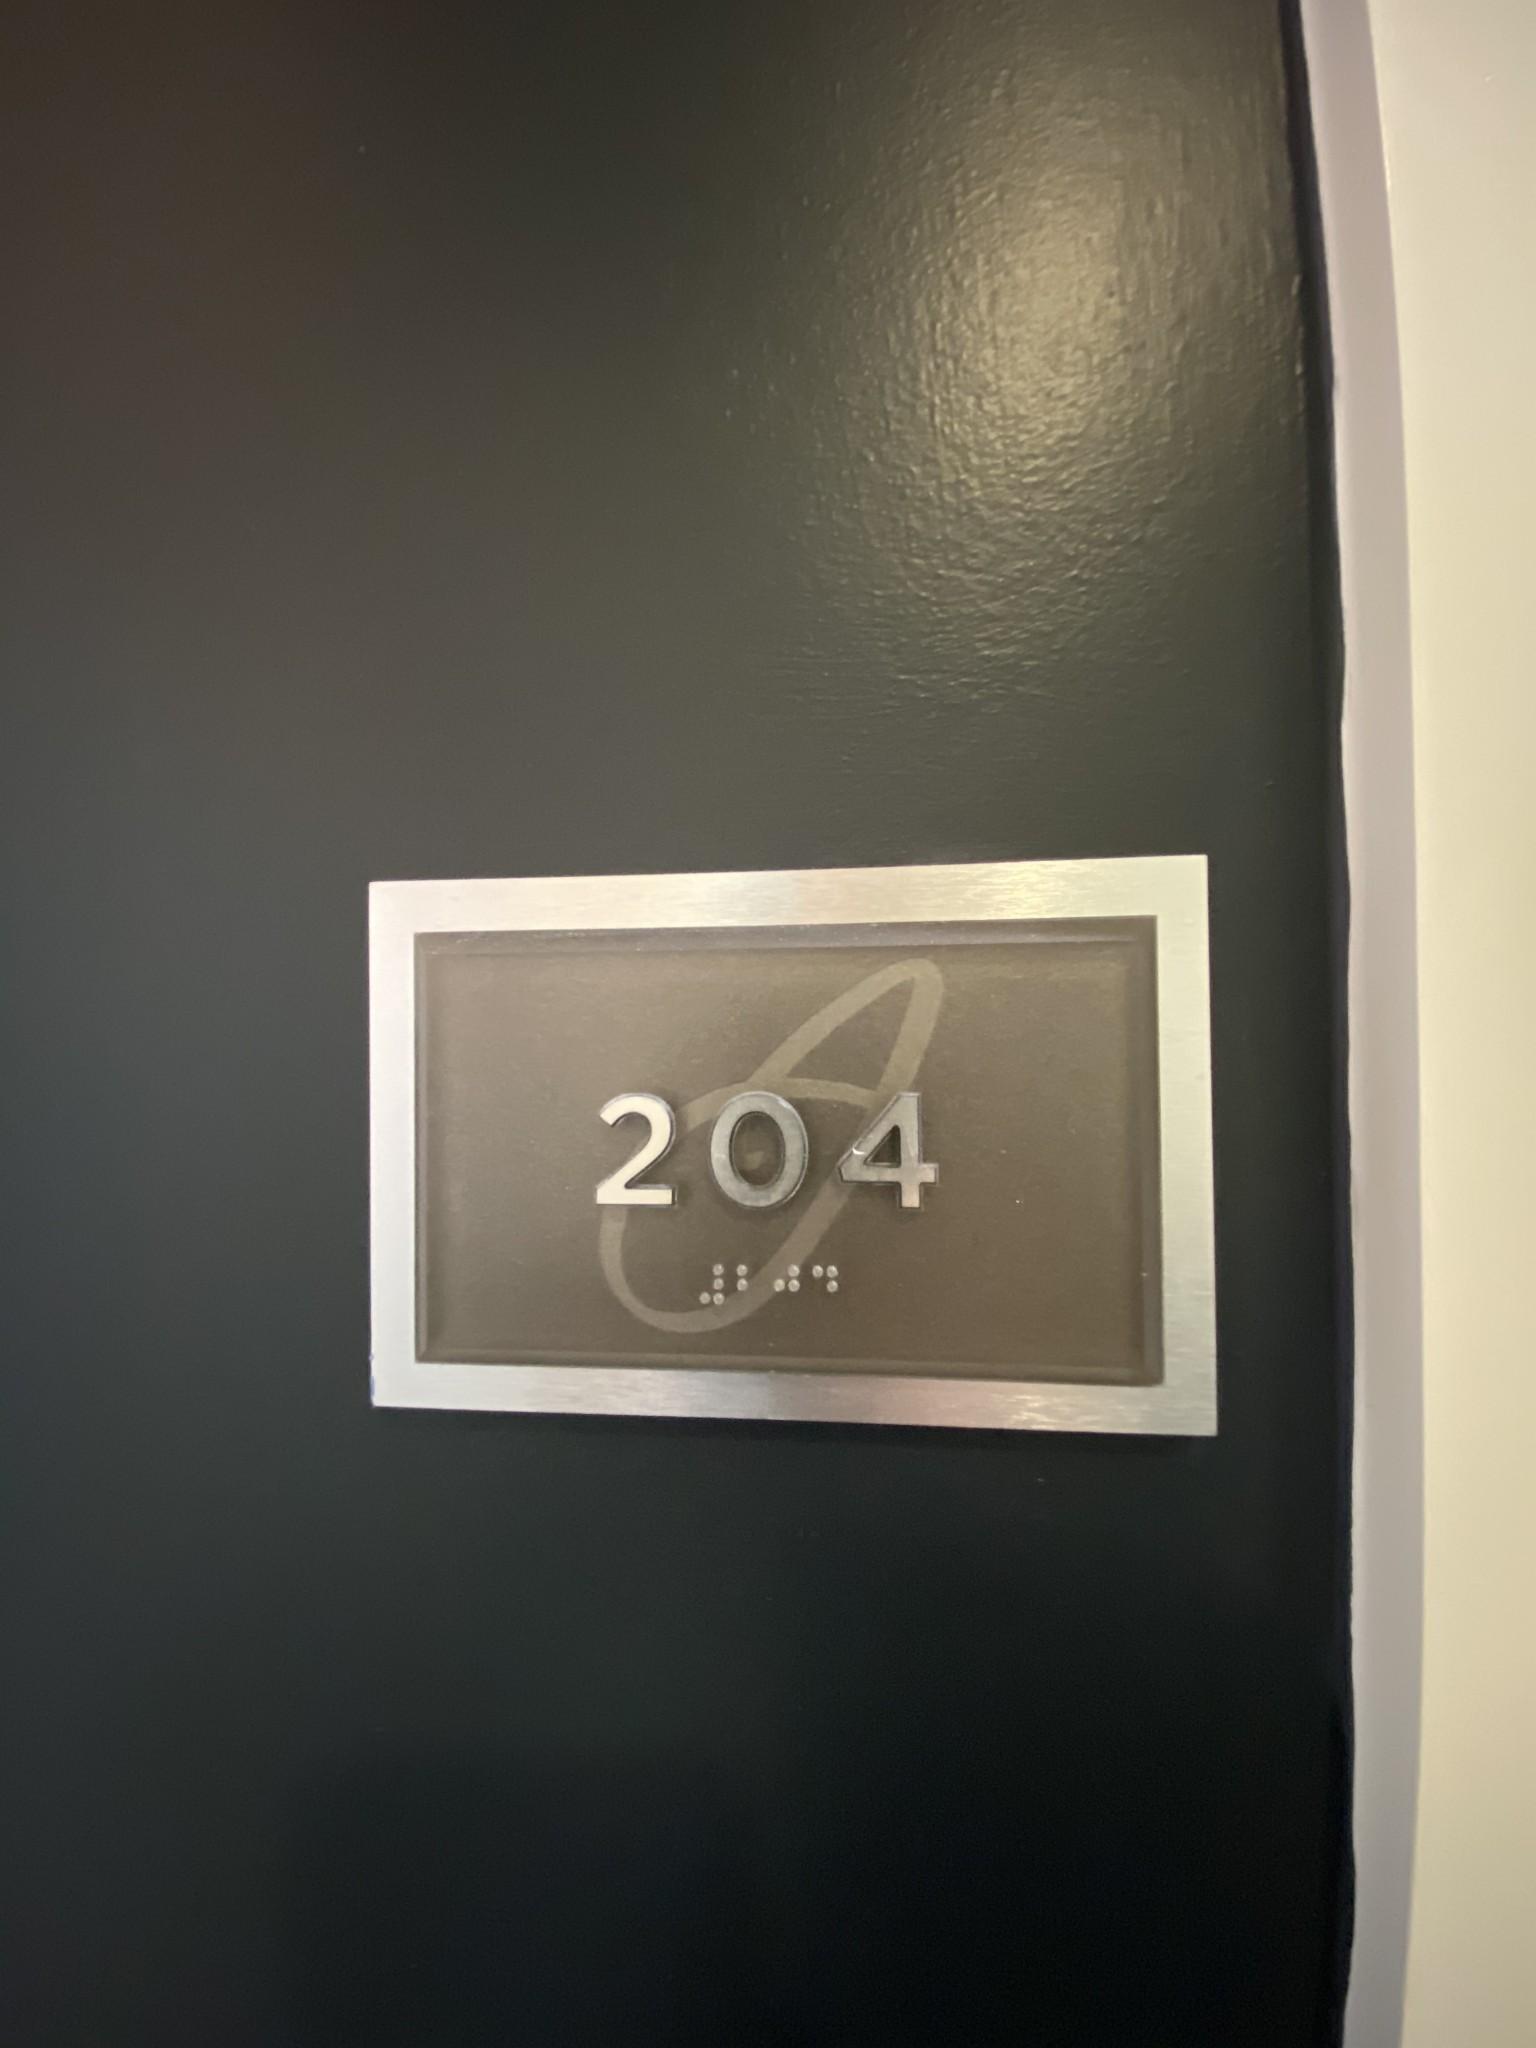 1002 Division St #204 Property Photo - Nashville, TN real estate listing